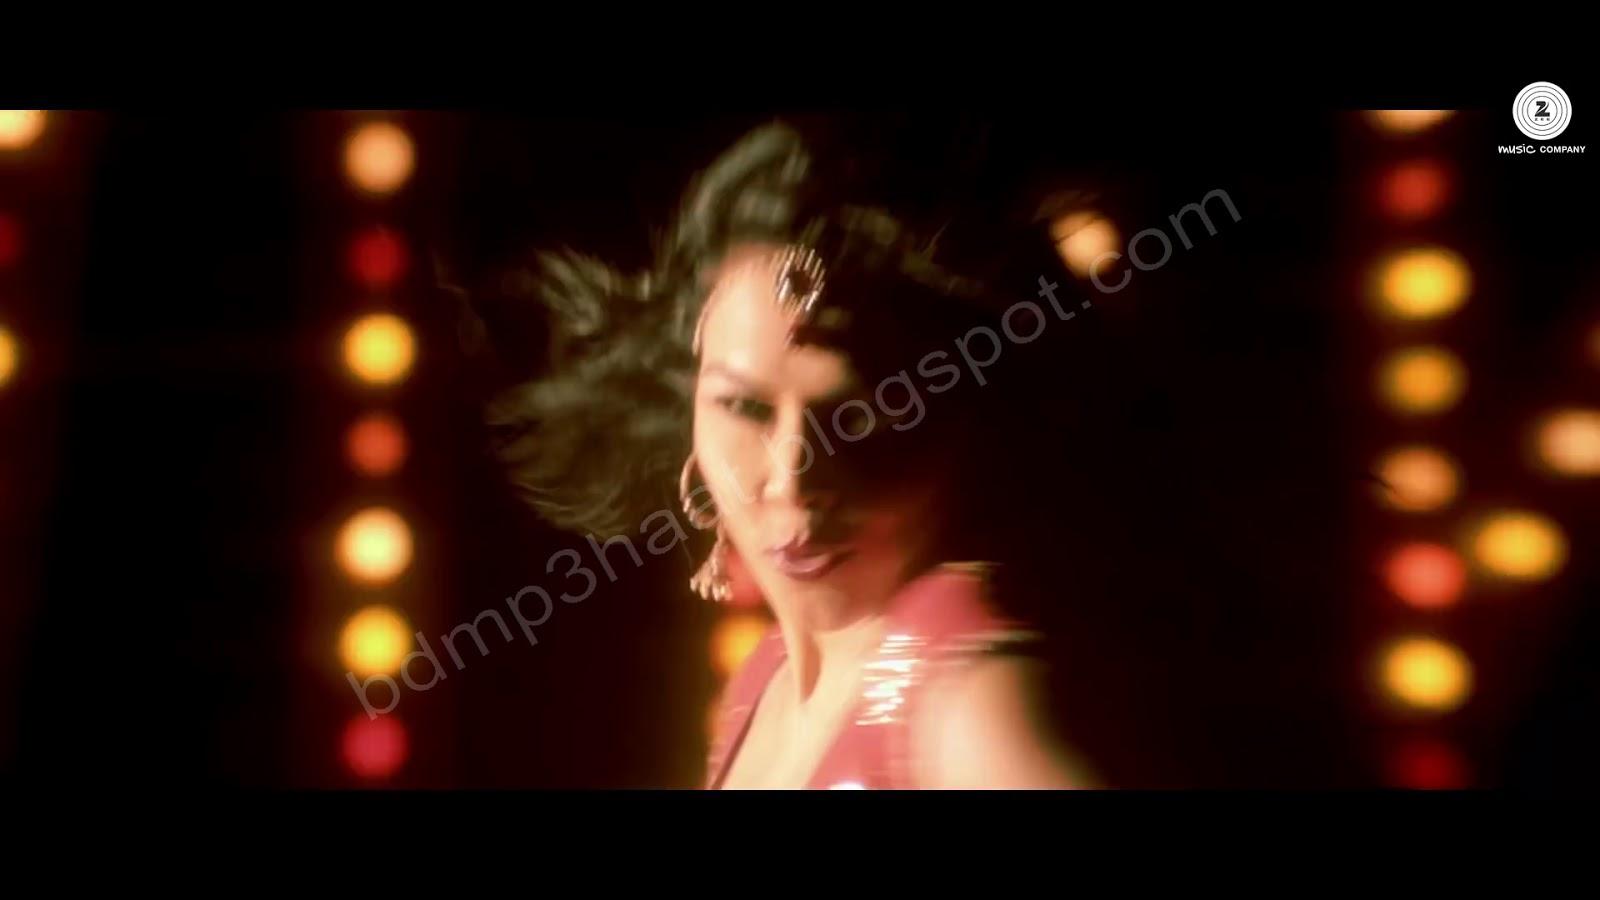 Bairavaa mp3 songs free download hd mp4 3gp 720p video songs.